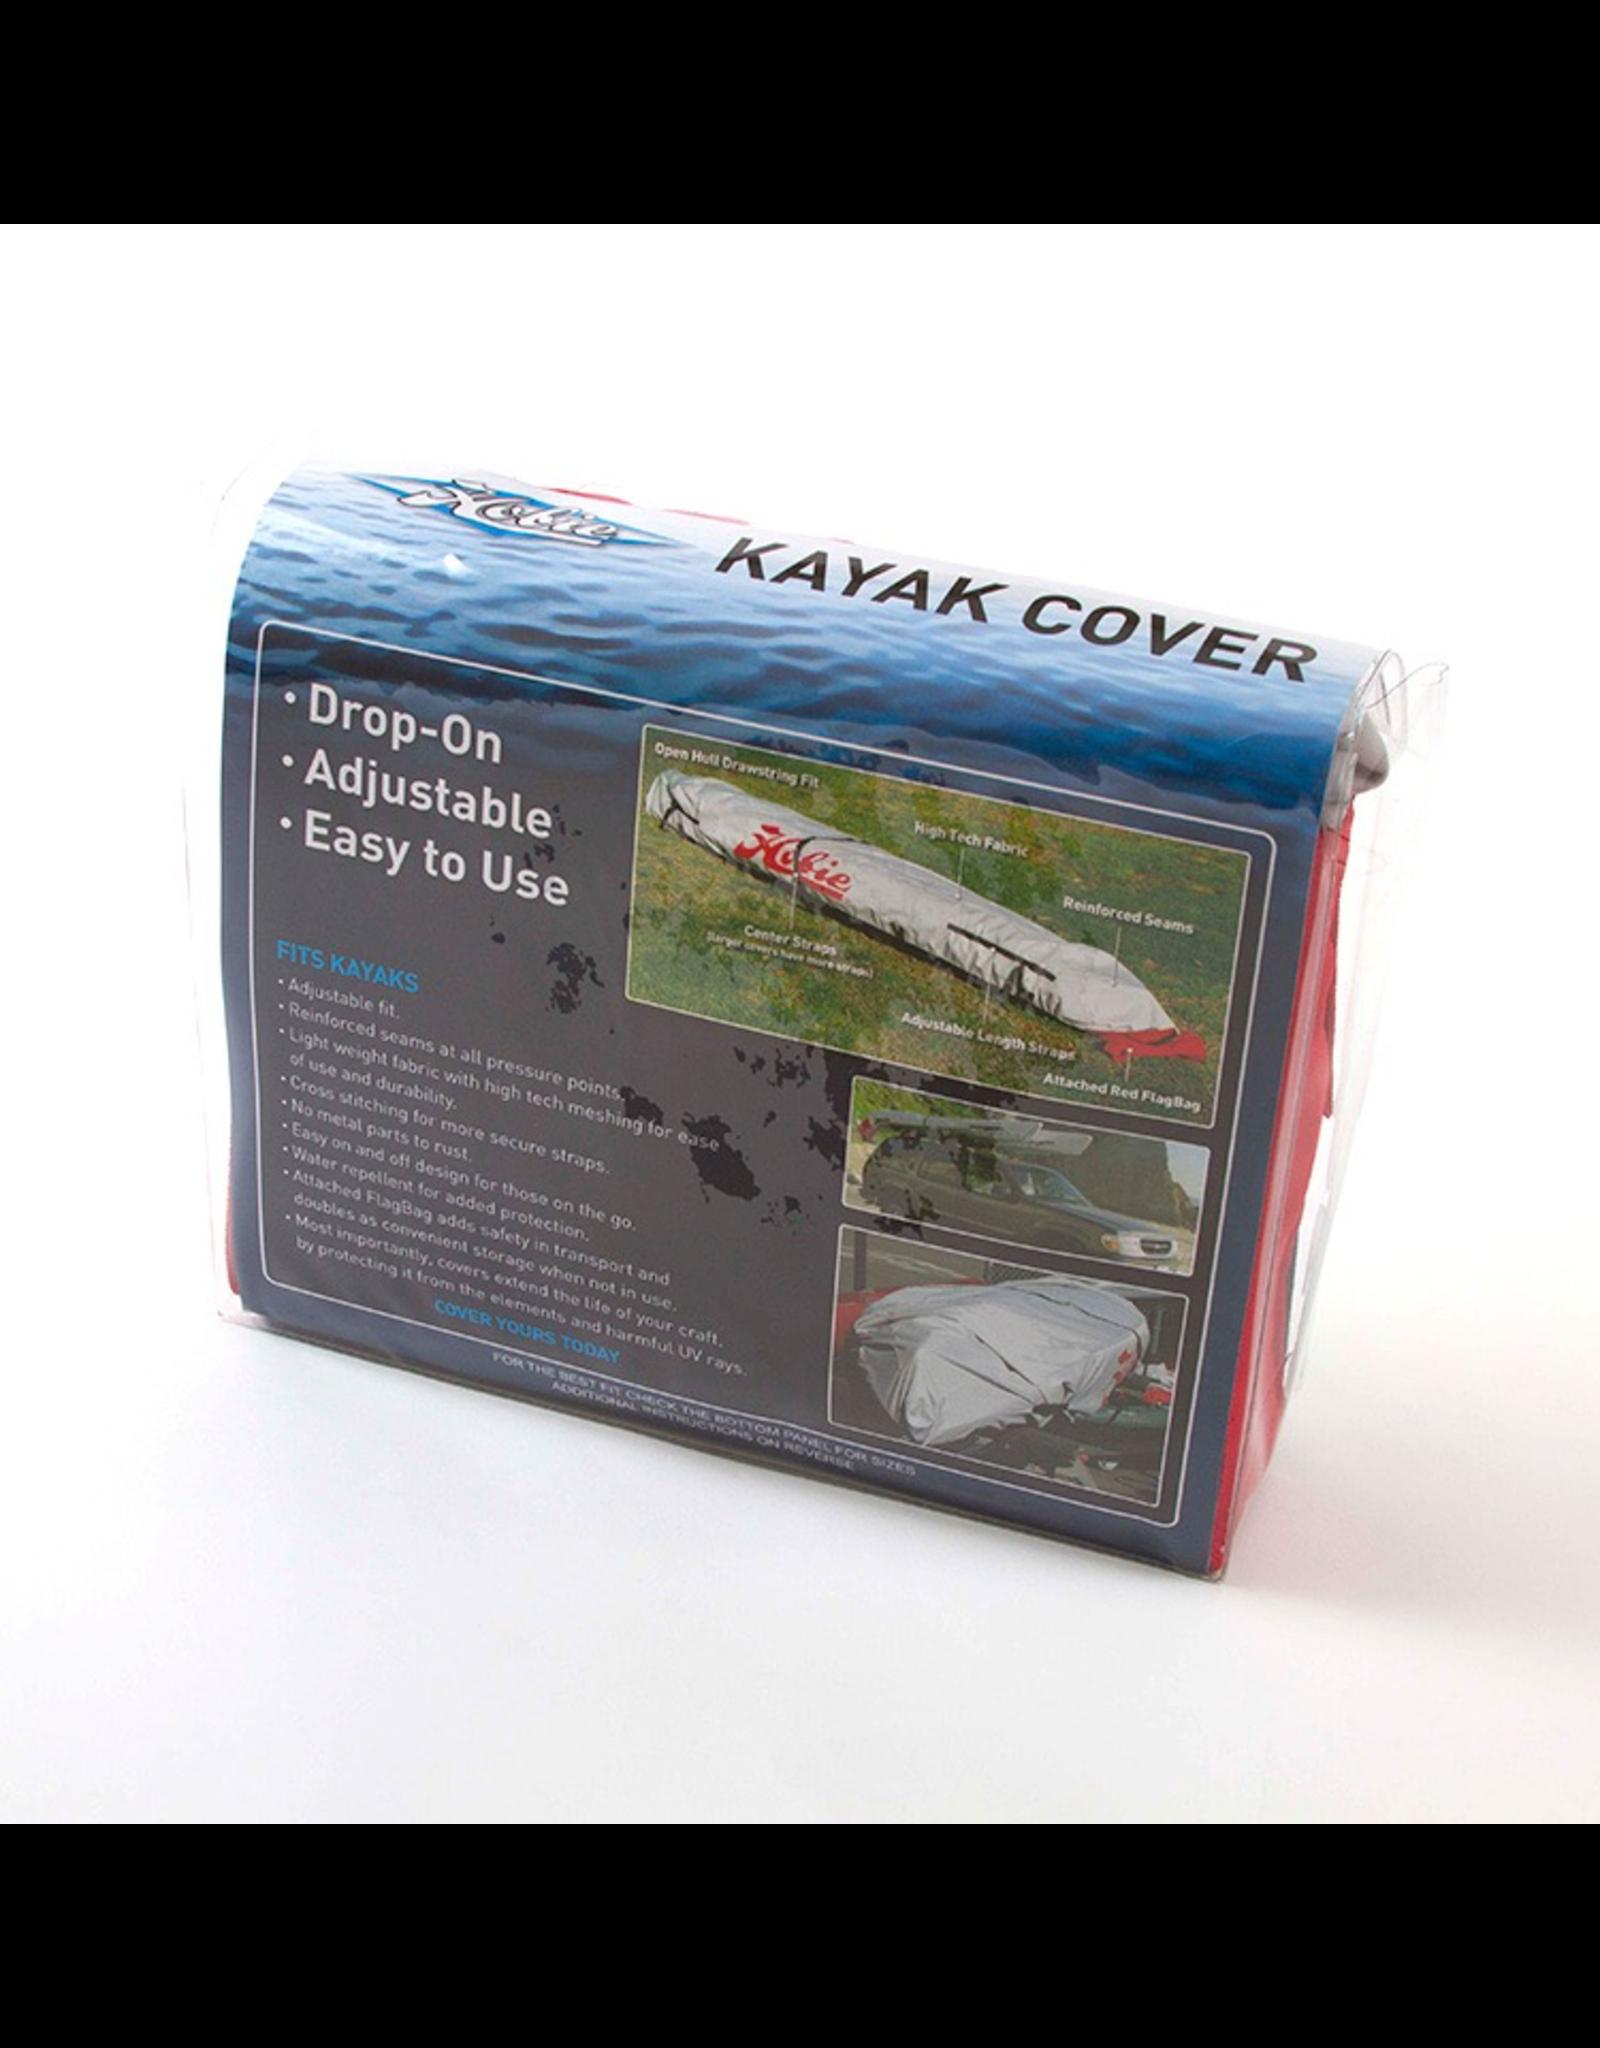 Hobie Hobie Kayak Cover for Hobie Kayaks.  Fits 14'-16' kayaks